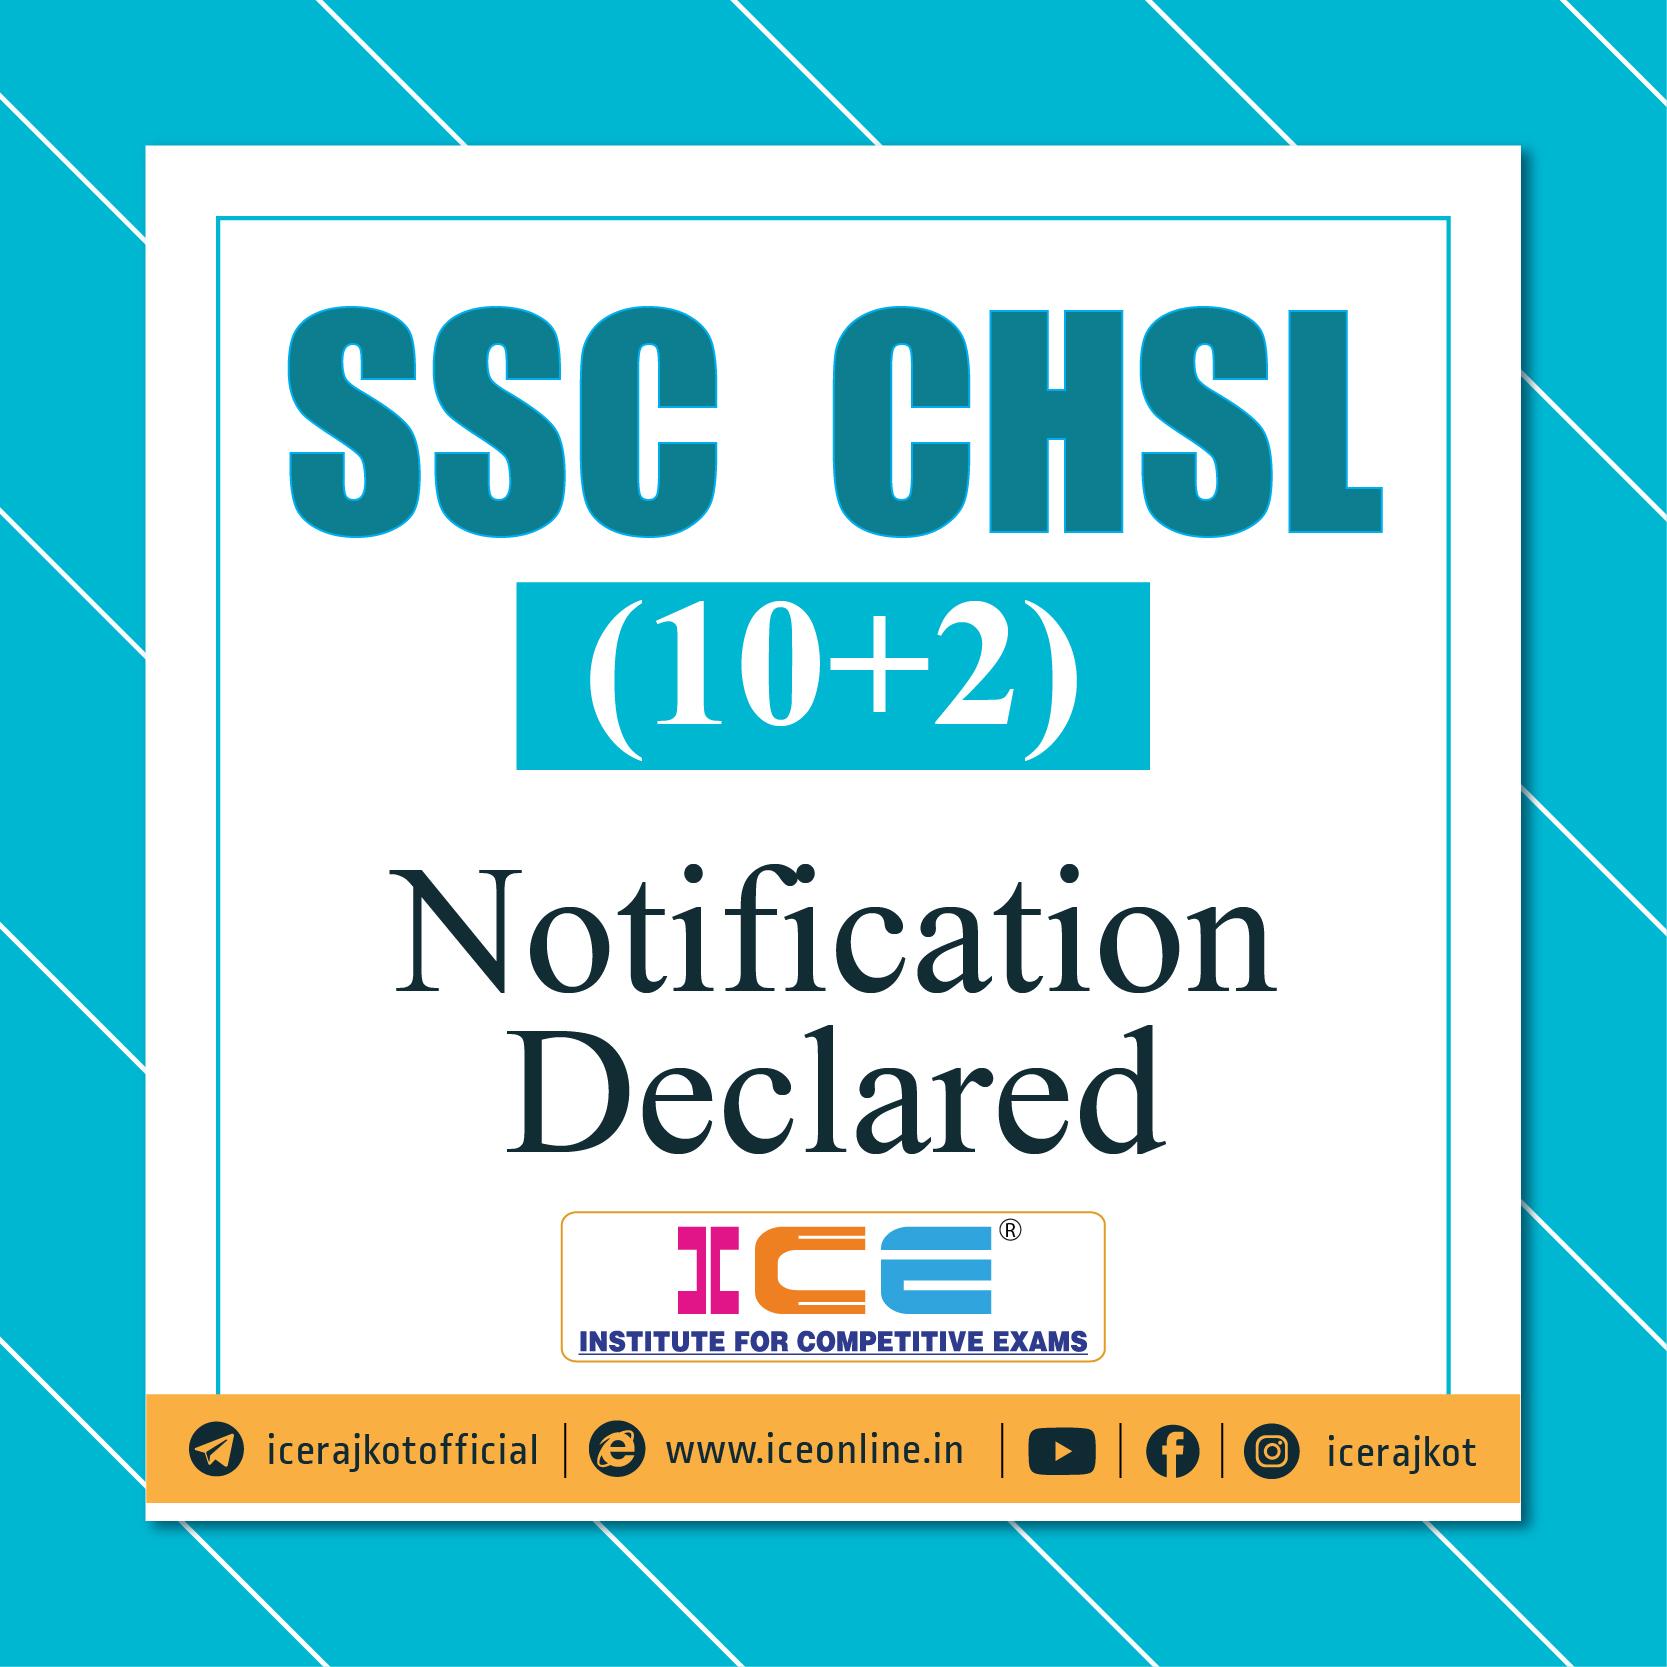 SSC CHSL (10+2) Notification Declared